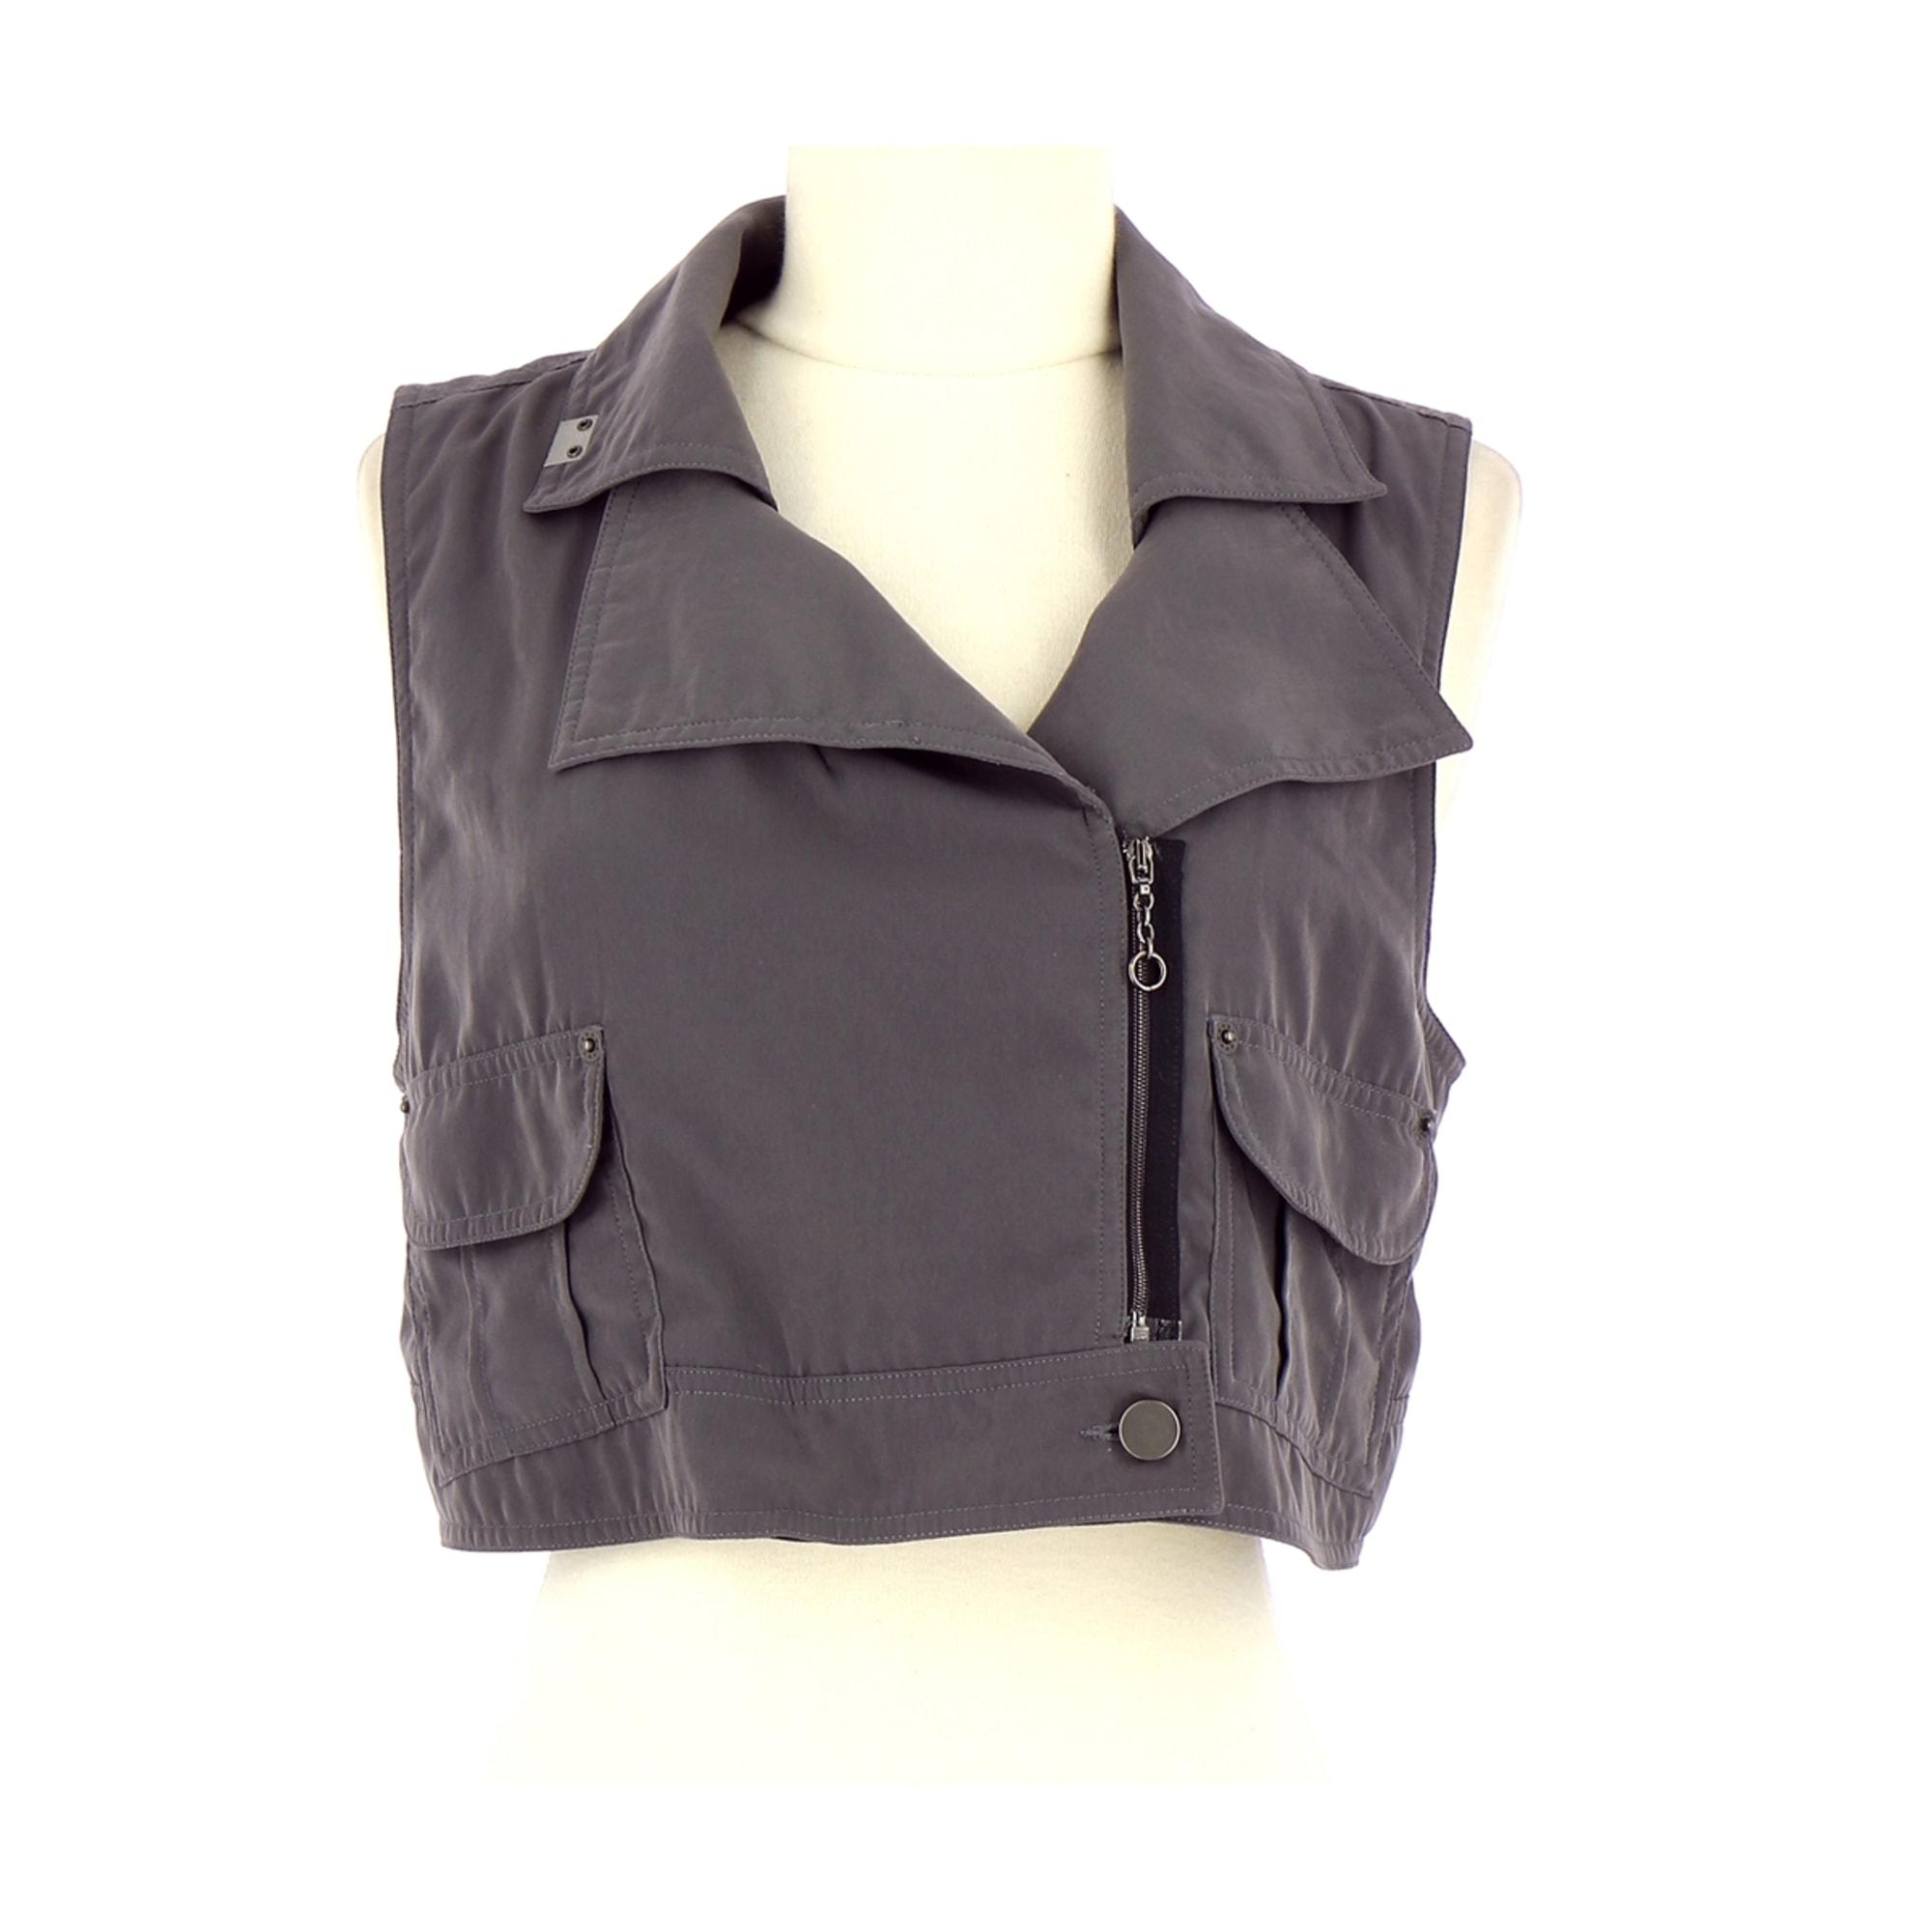 Gilet, cardigan COP-COPINE Violet, mauve, lavande